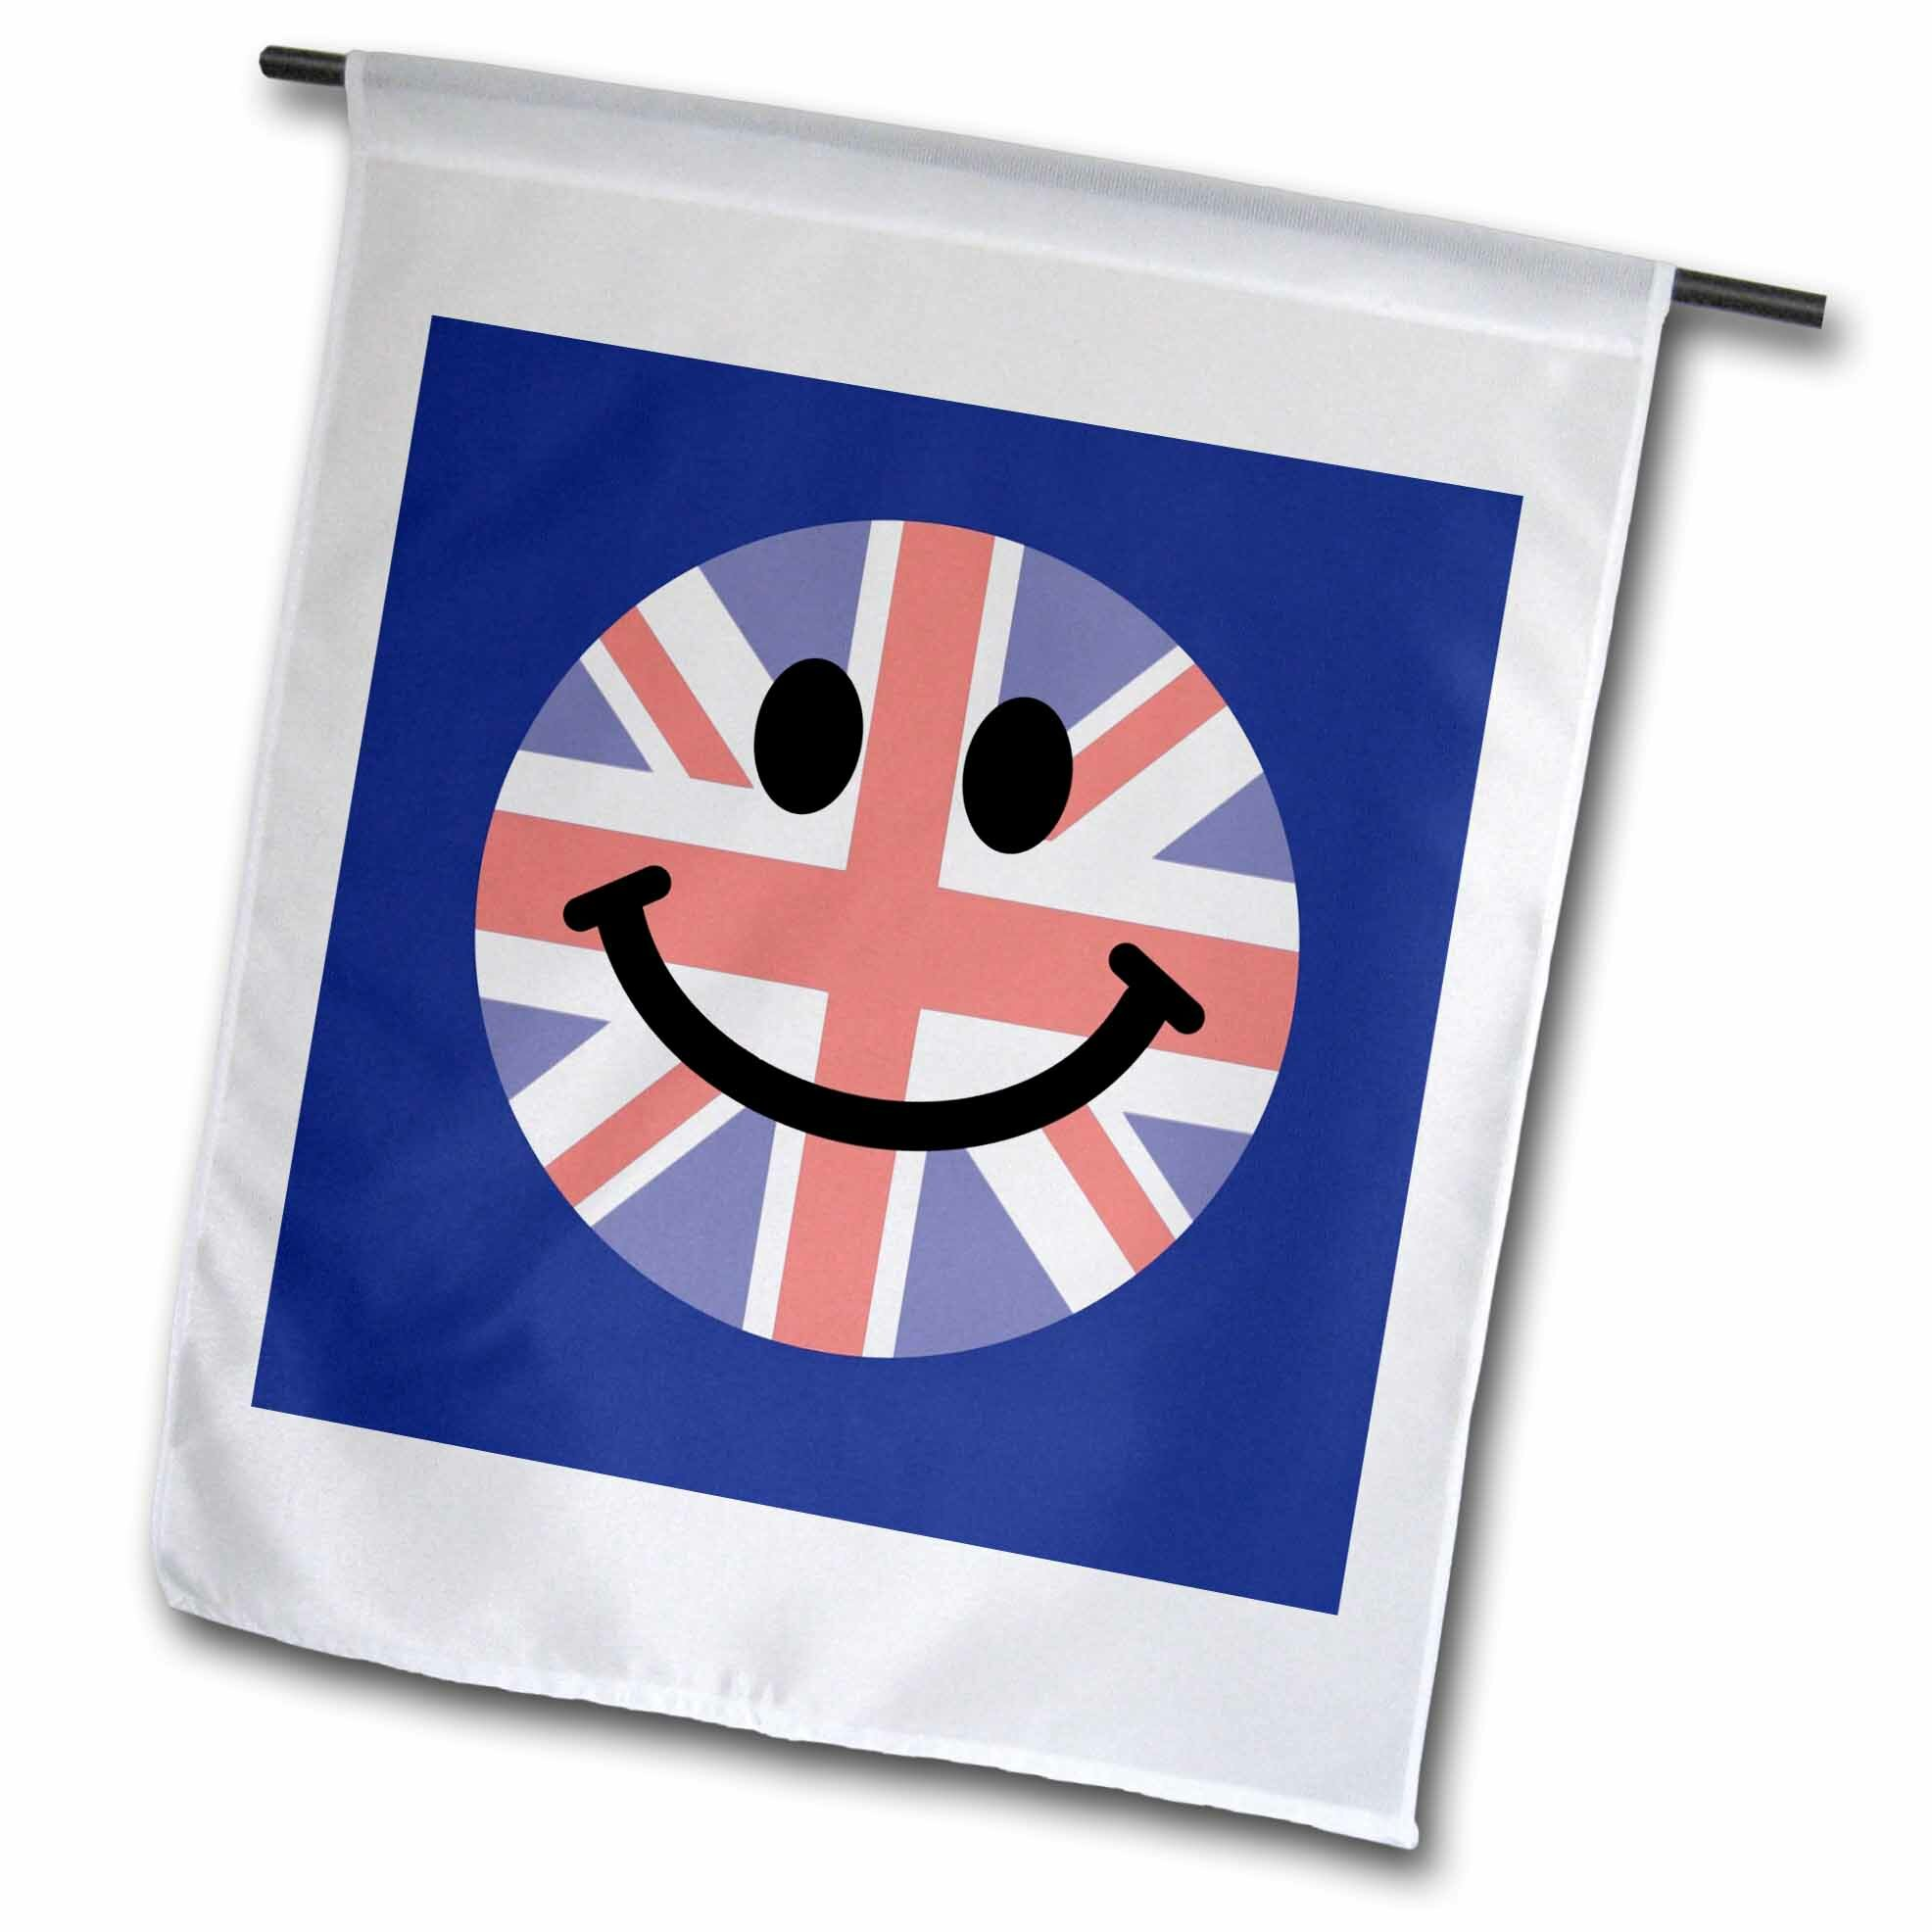 100/% Polyester With Eyelets Flag English Gloucestershire New Flag 5 x 3 FT